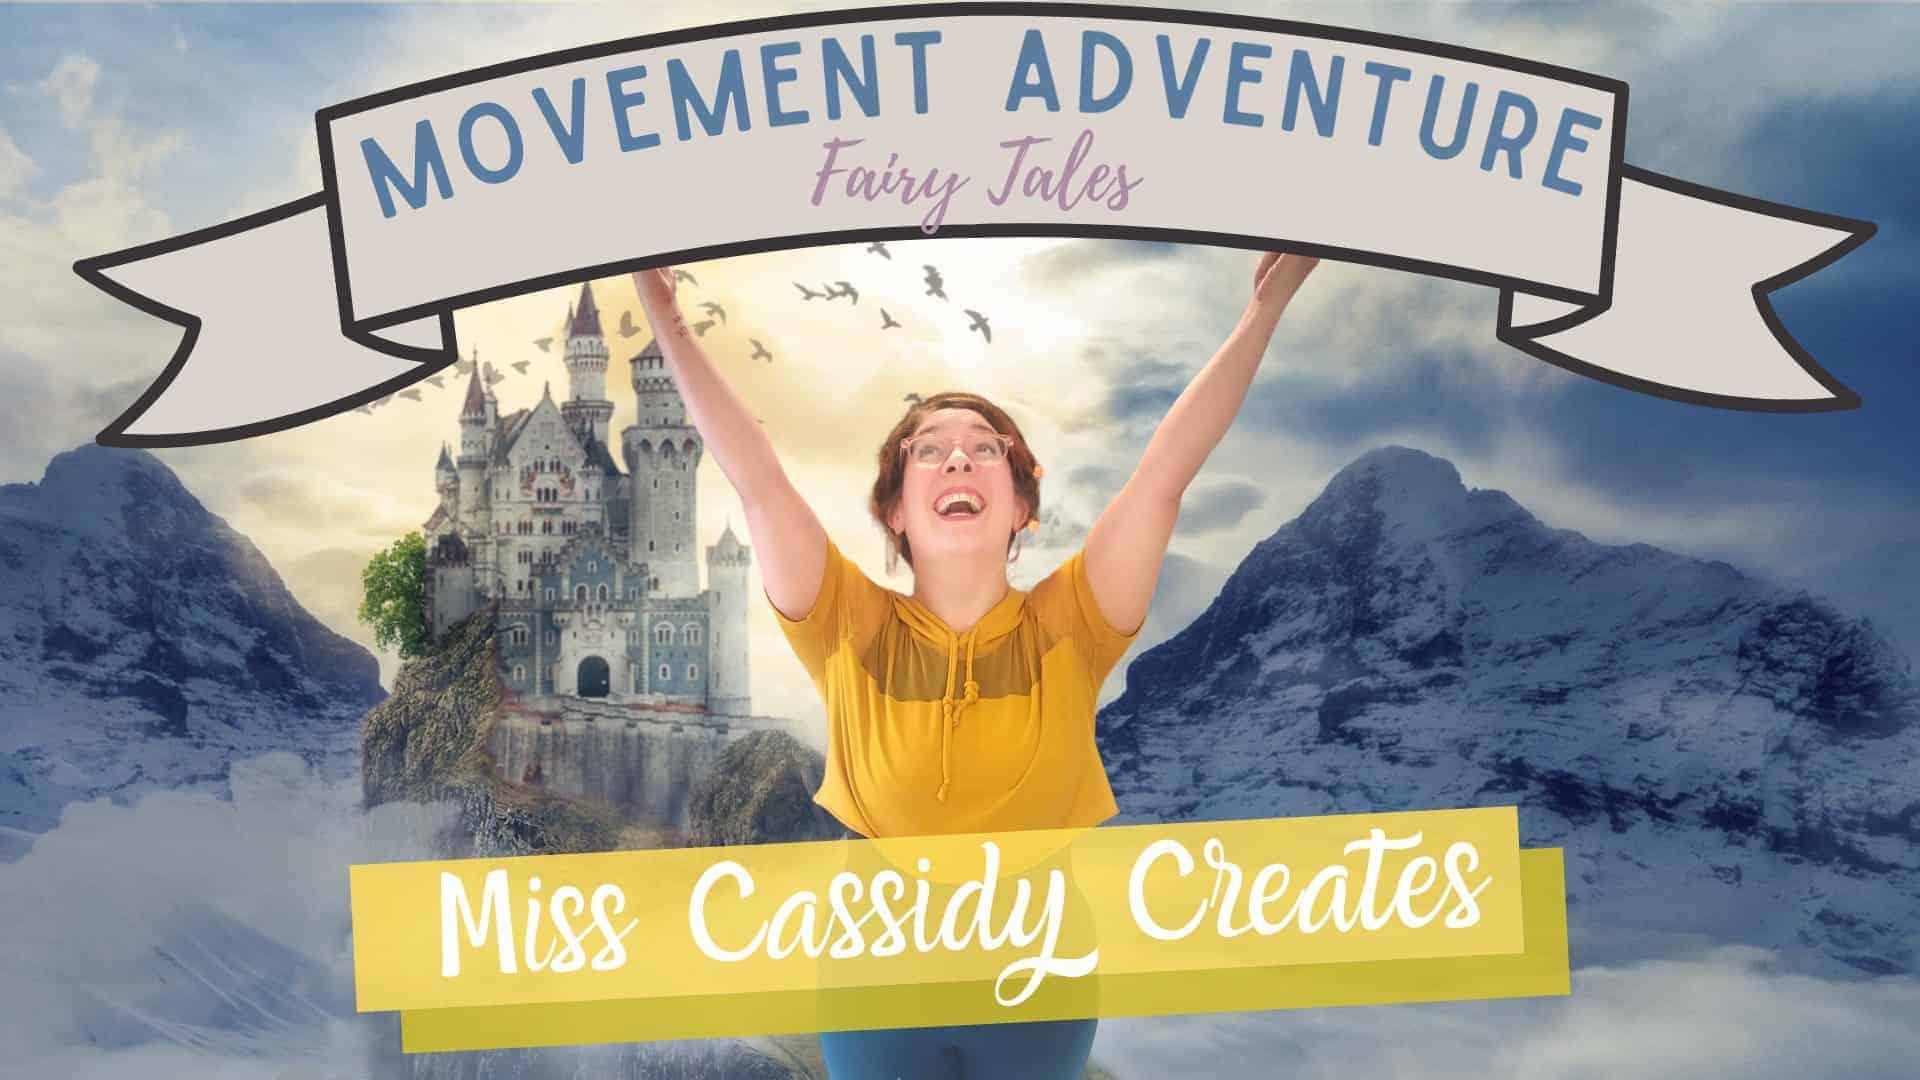 Miss Cassidy Creates - Movement Adventures